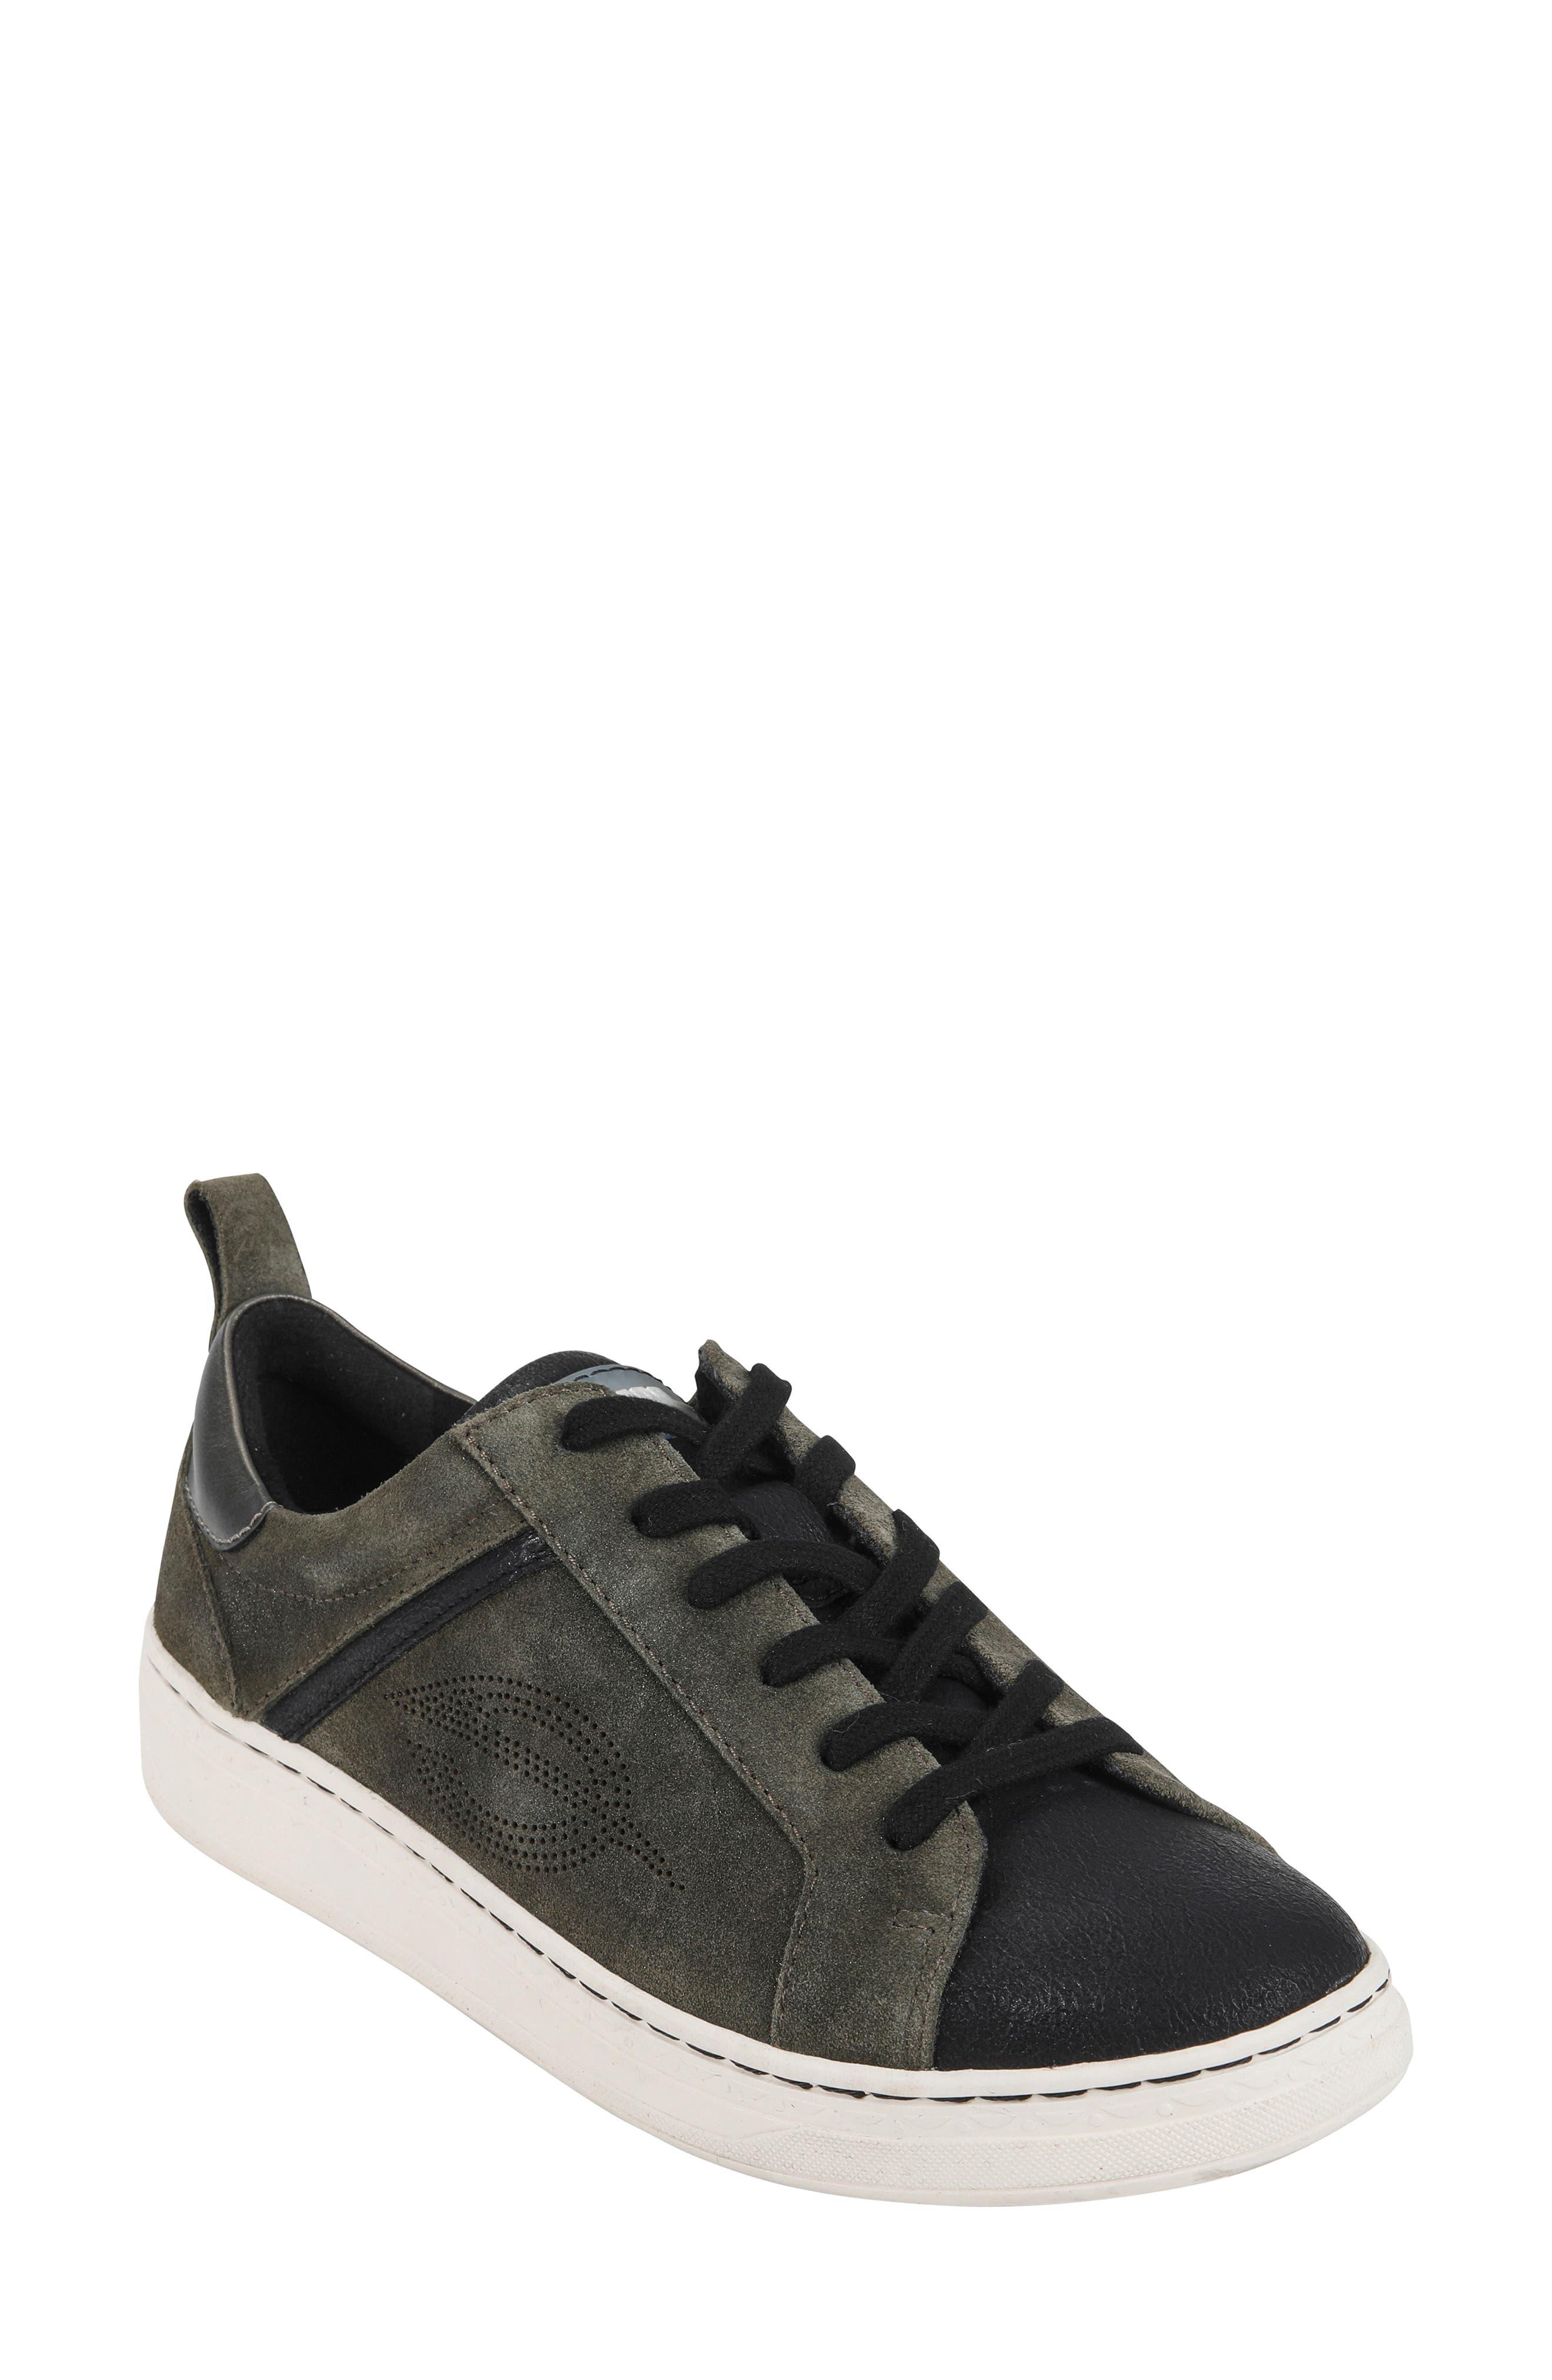 Zinnia Low Top Sneaker,                             Main thumbnail 1, color,                             BLACK METALLIC FAUX LEATHER